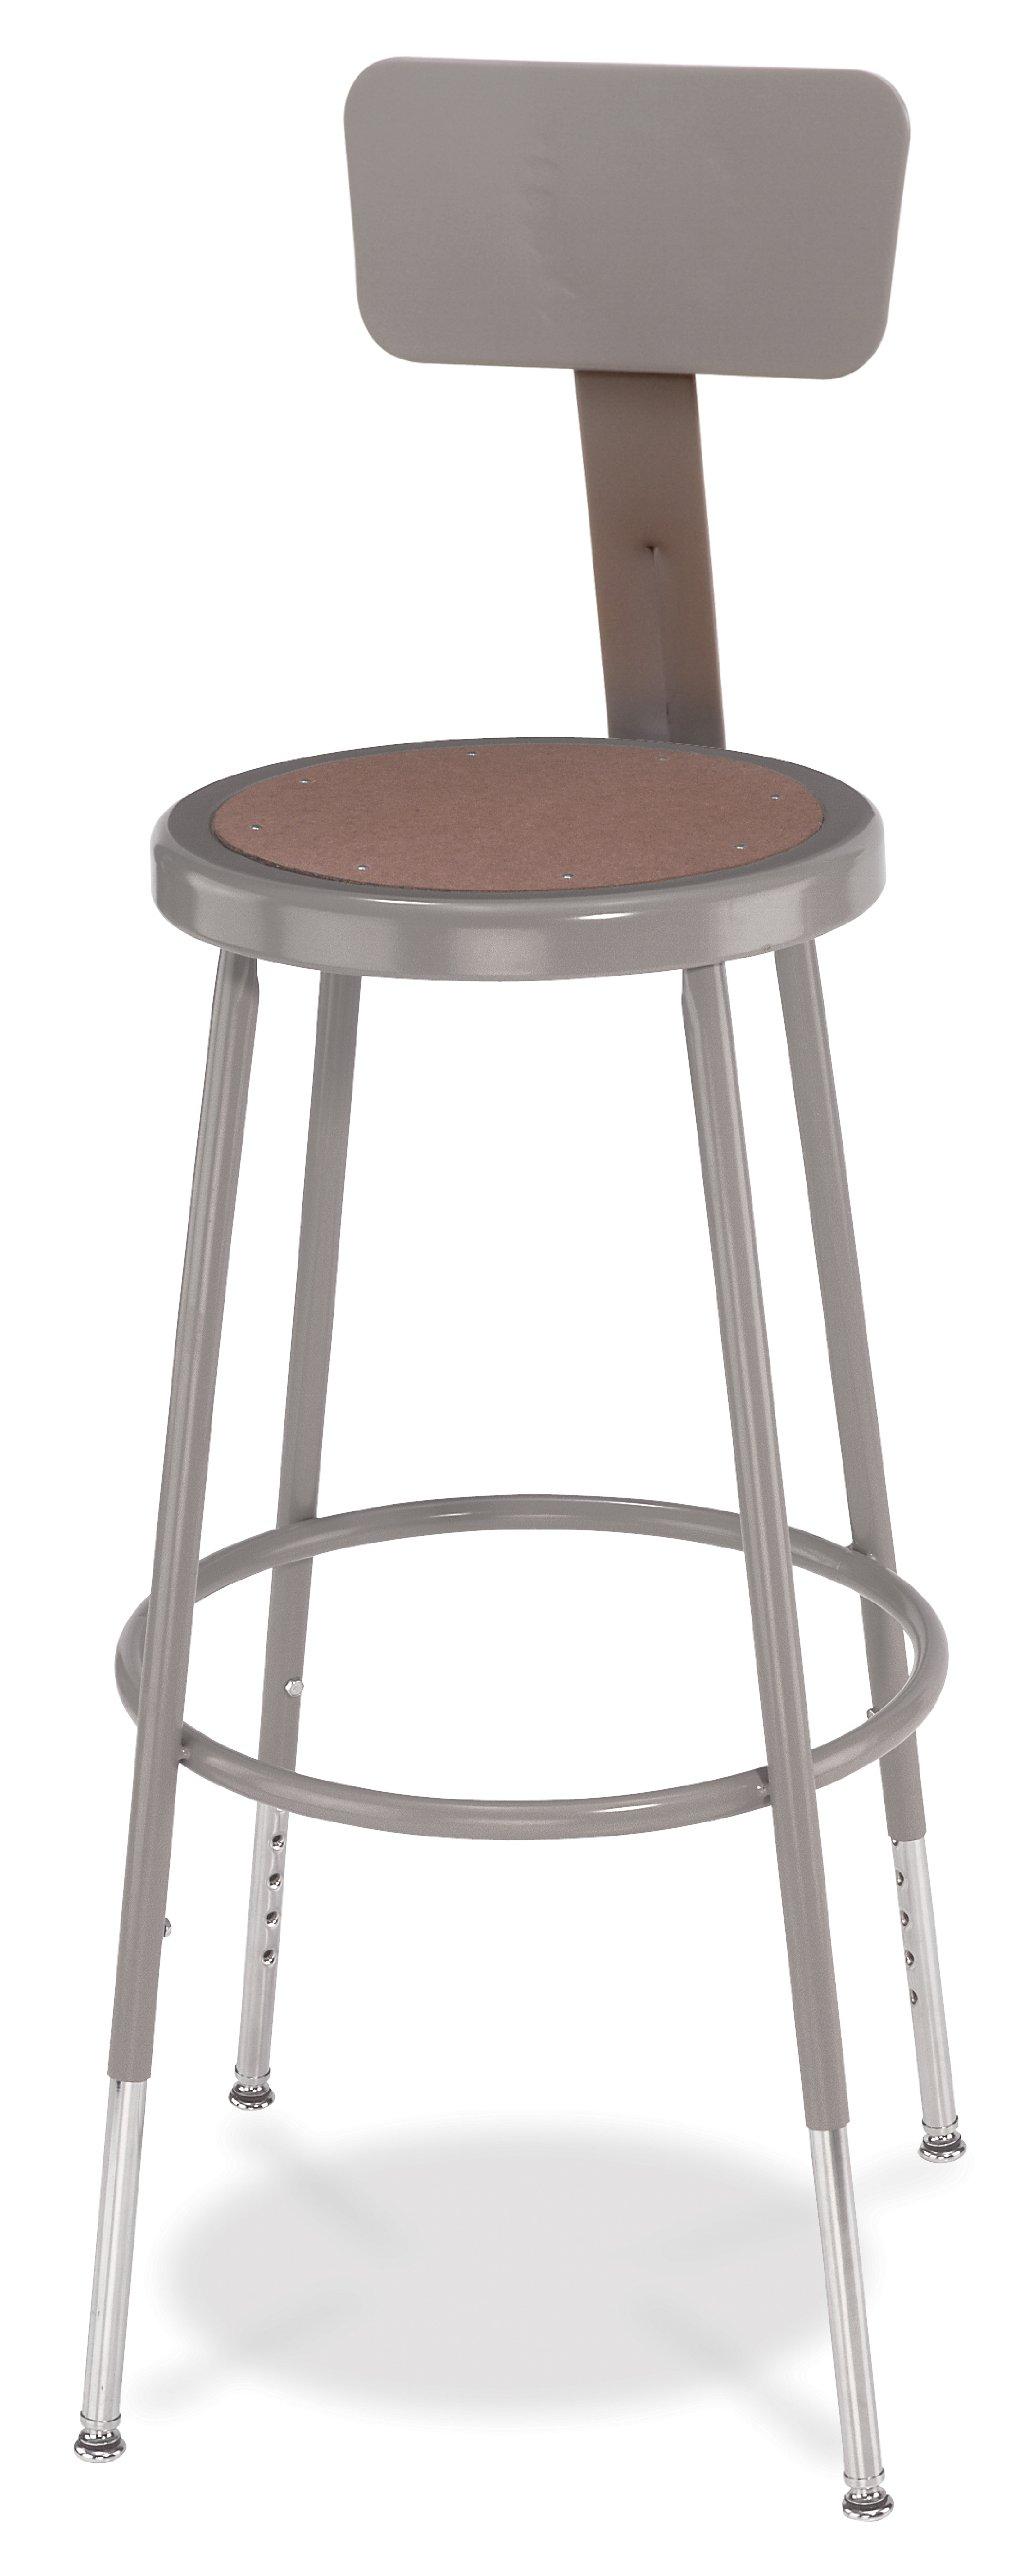 NPS 24'' Adjustable Height Steel Stool with Backrest, Grey